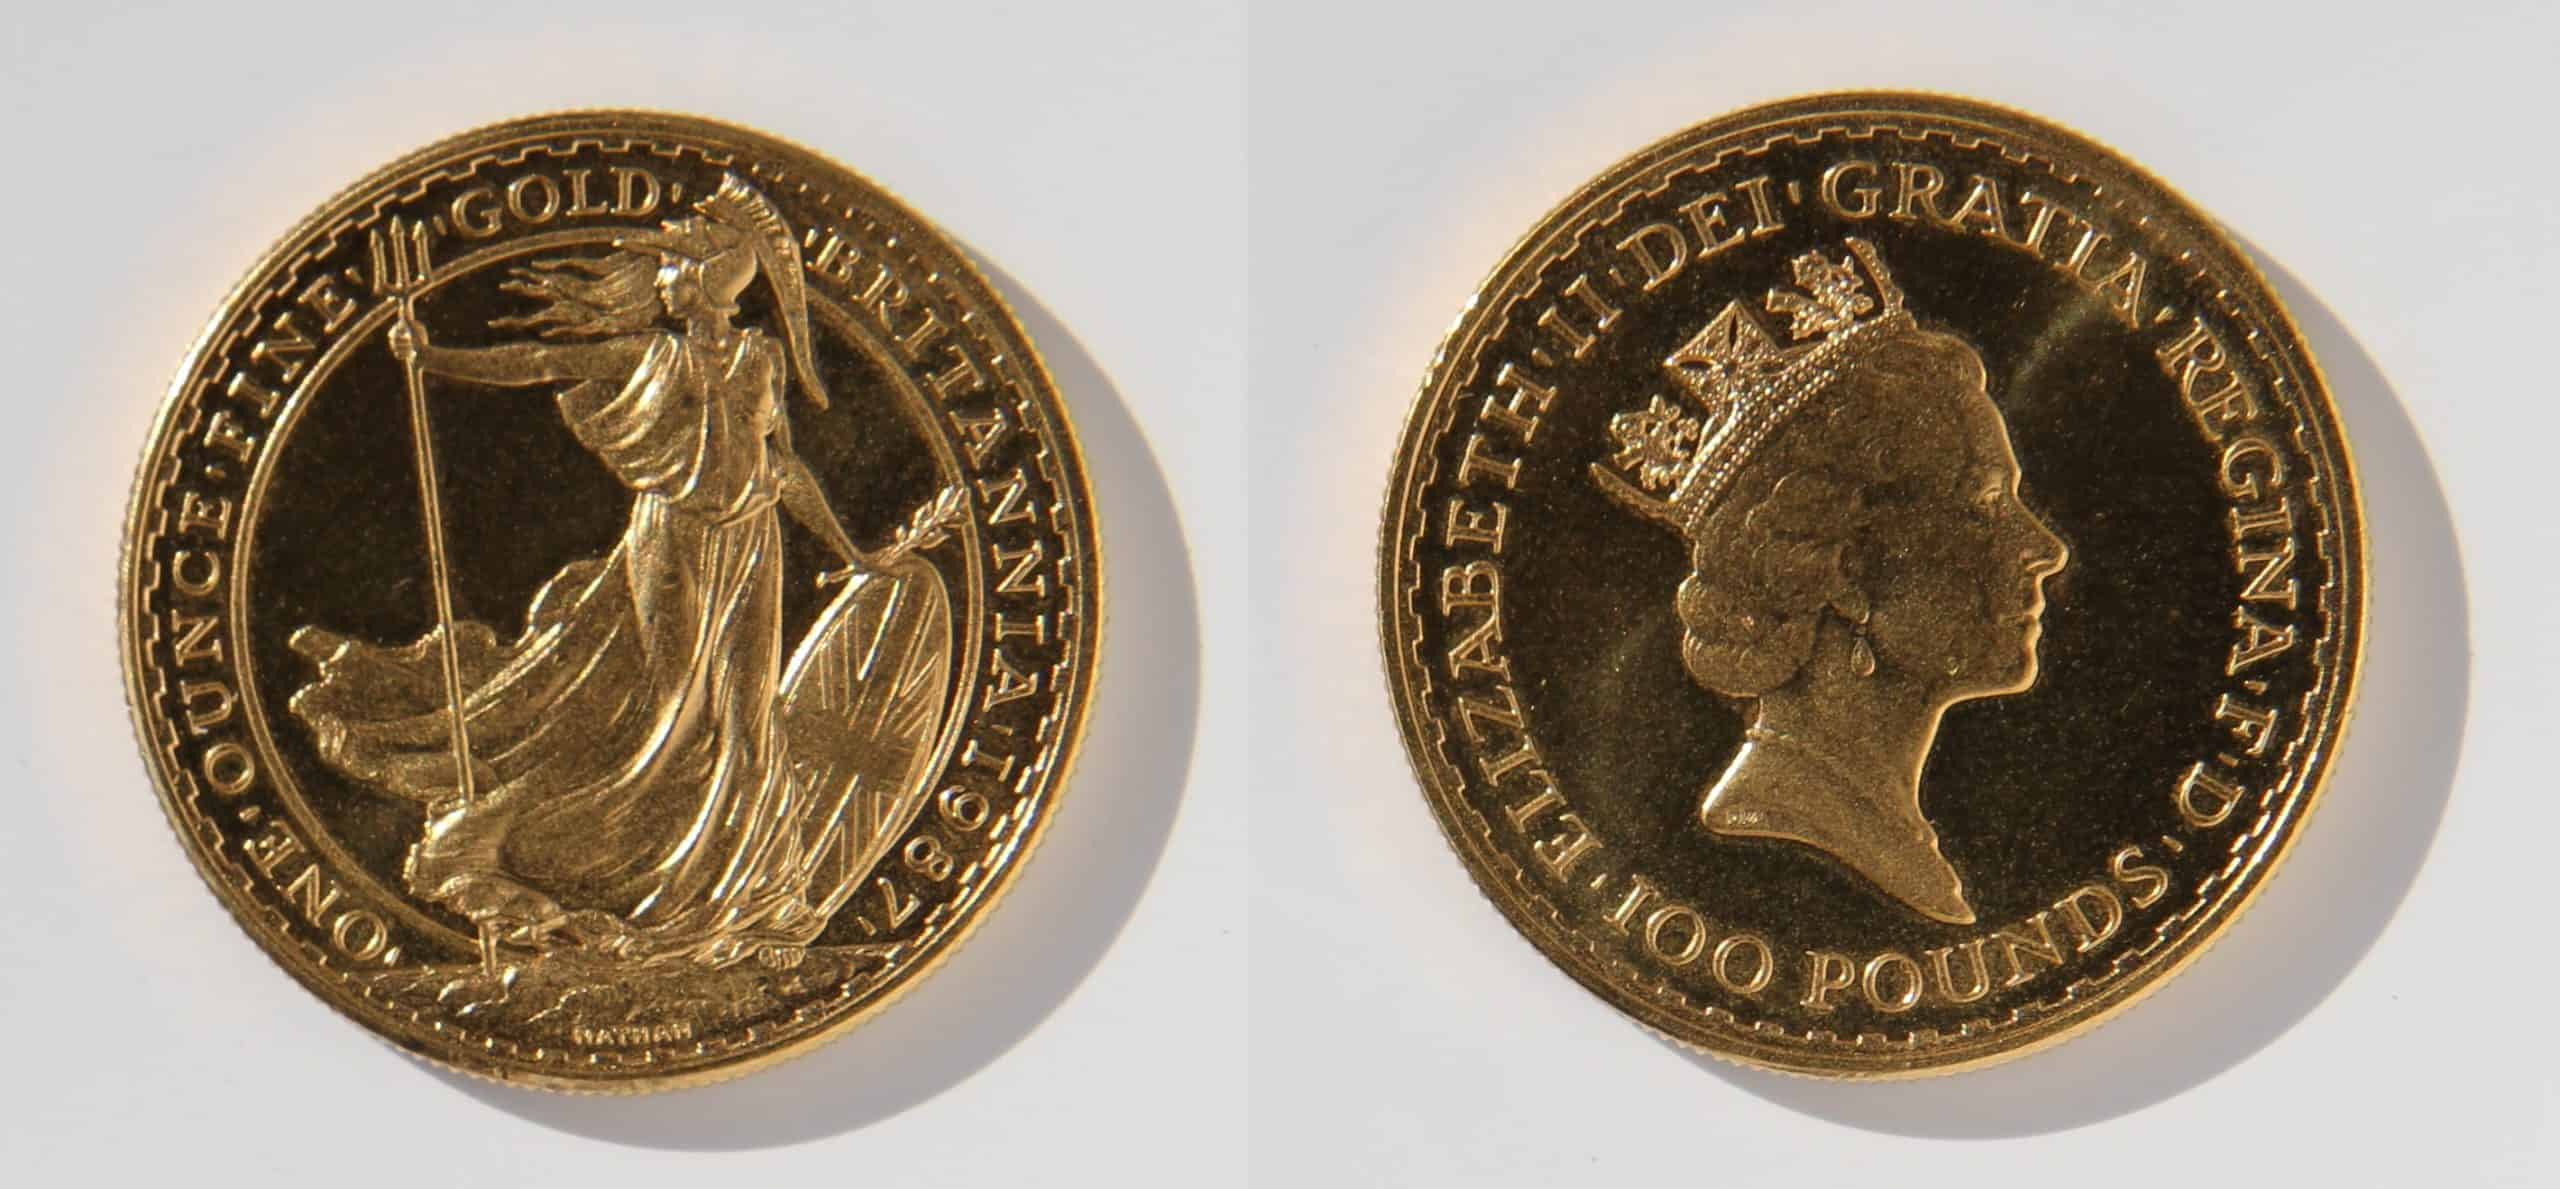 Goldmünze Britannia